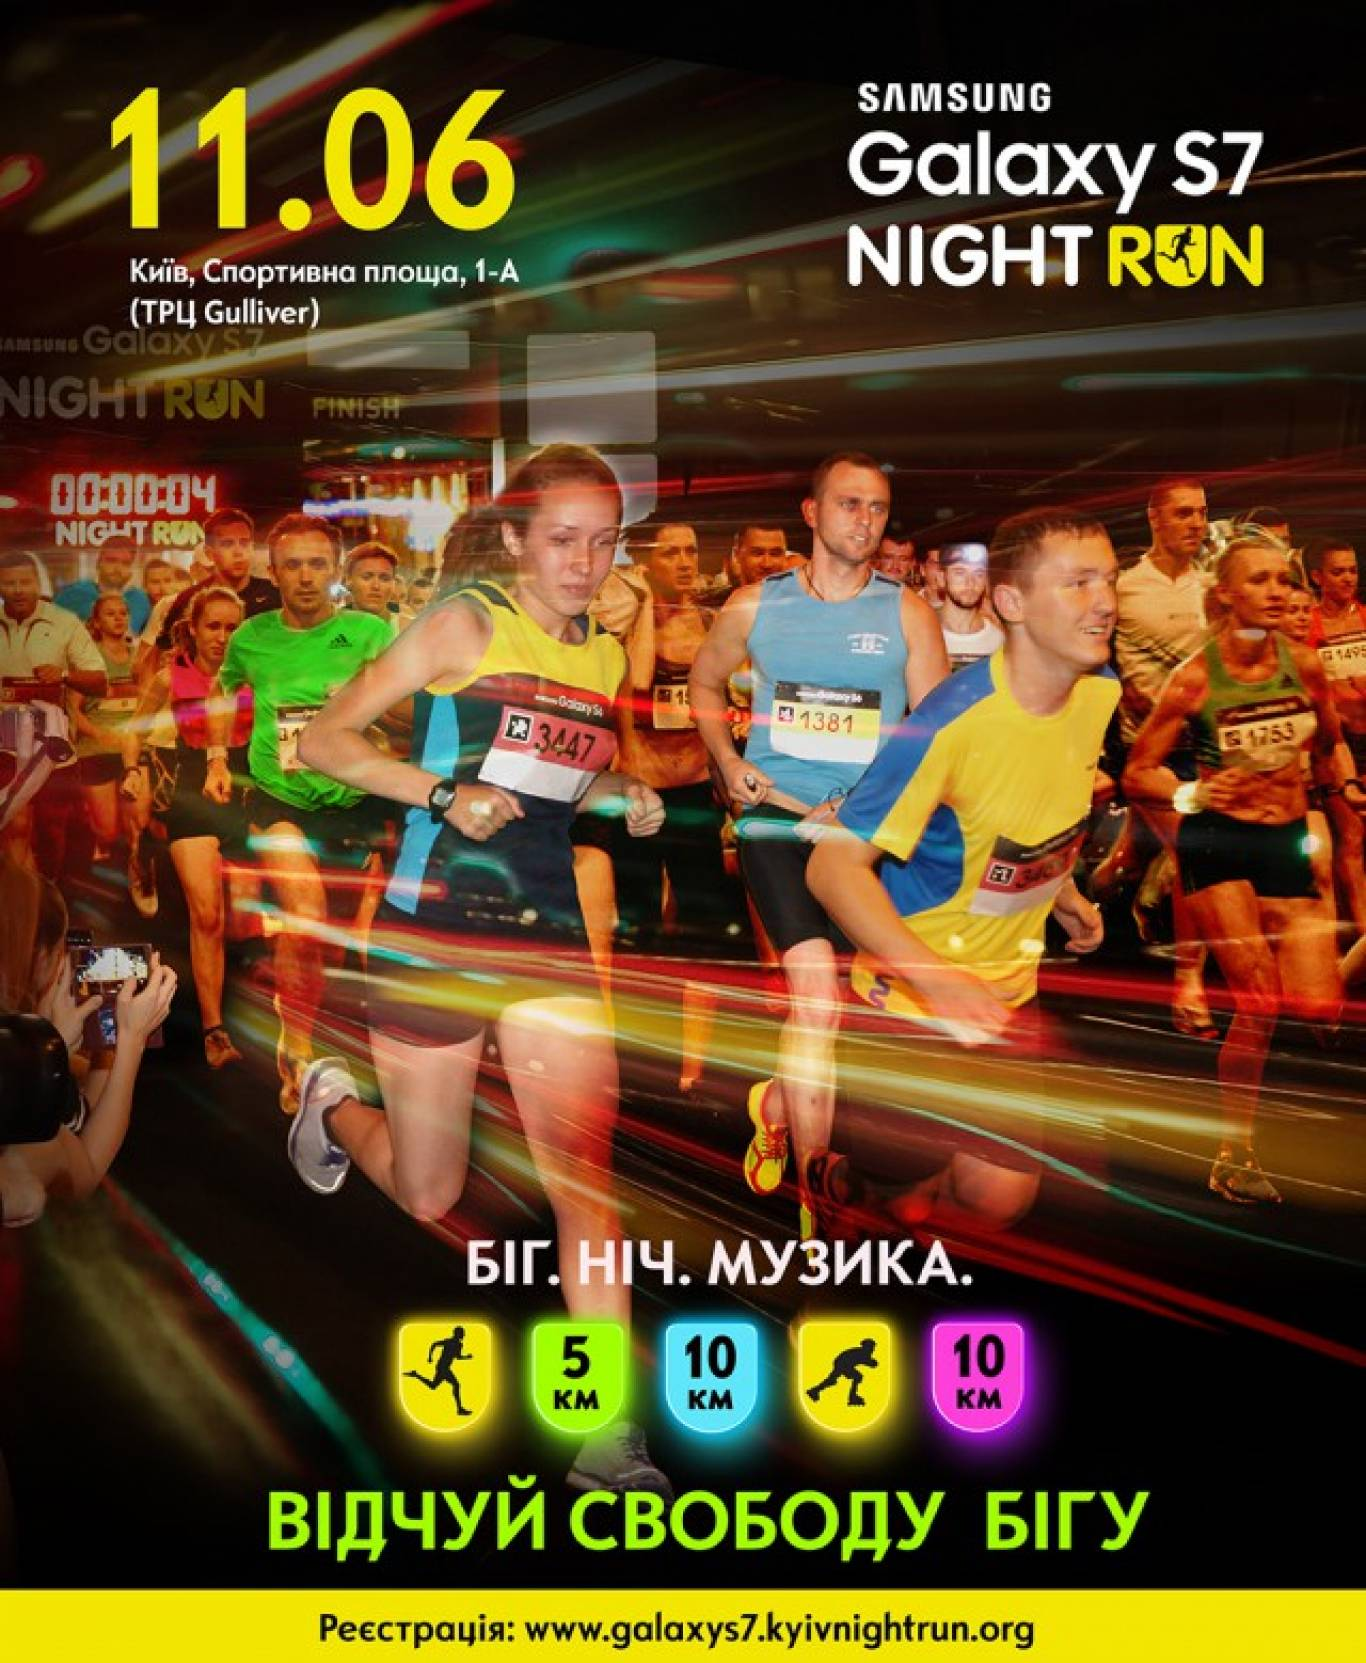 Нічний забіг Samsung Galaxy S7 Night Run